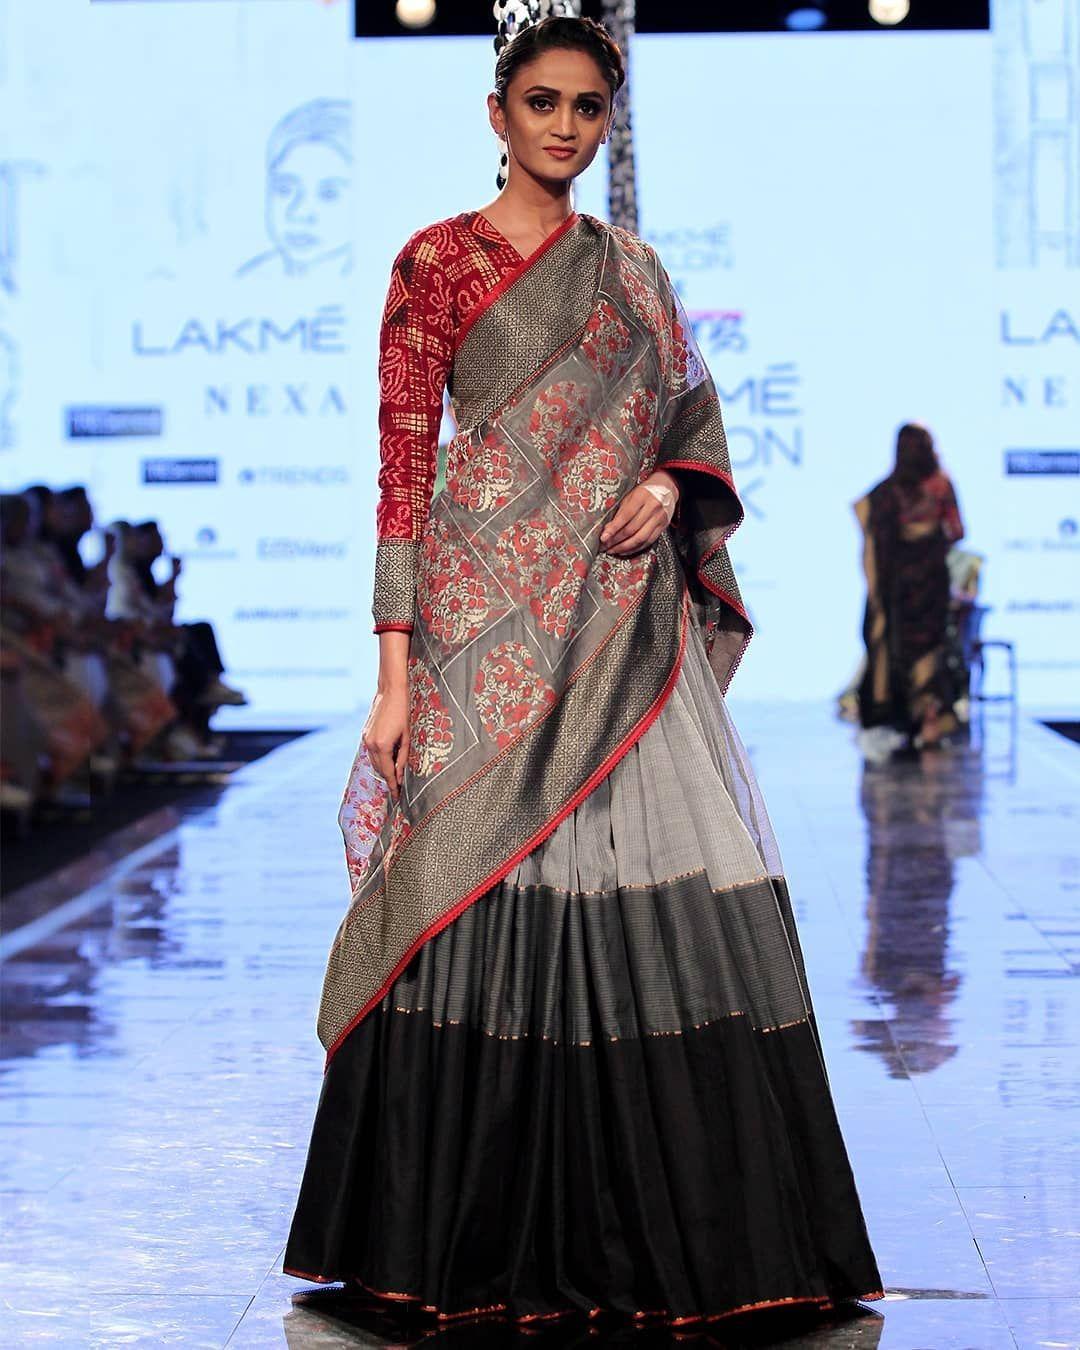 Lakme Fashion Week 2020 Designer Outfit Inspiration Designer Wear Bride Groom Wedding Wear In 2020 Lakme Fashion Week Fashion Designer Party Wear Dresses